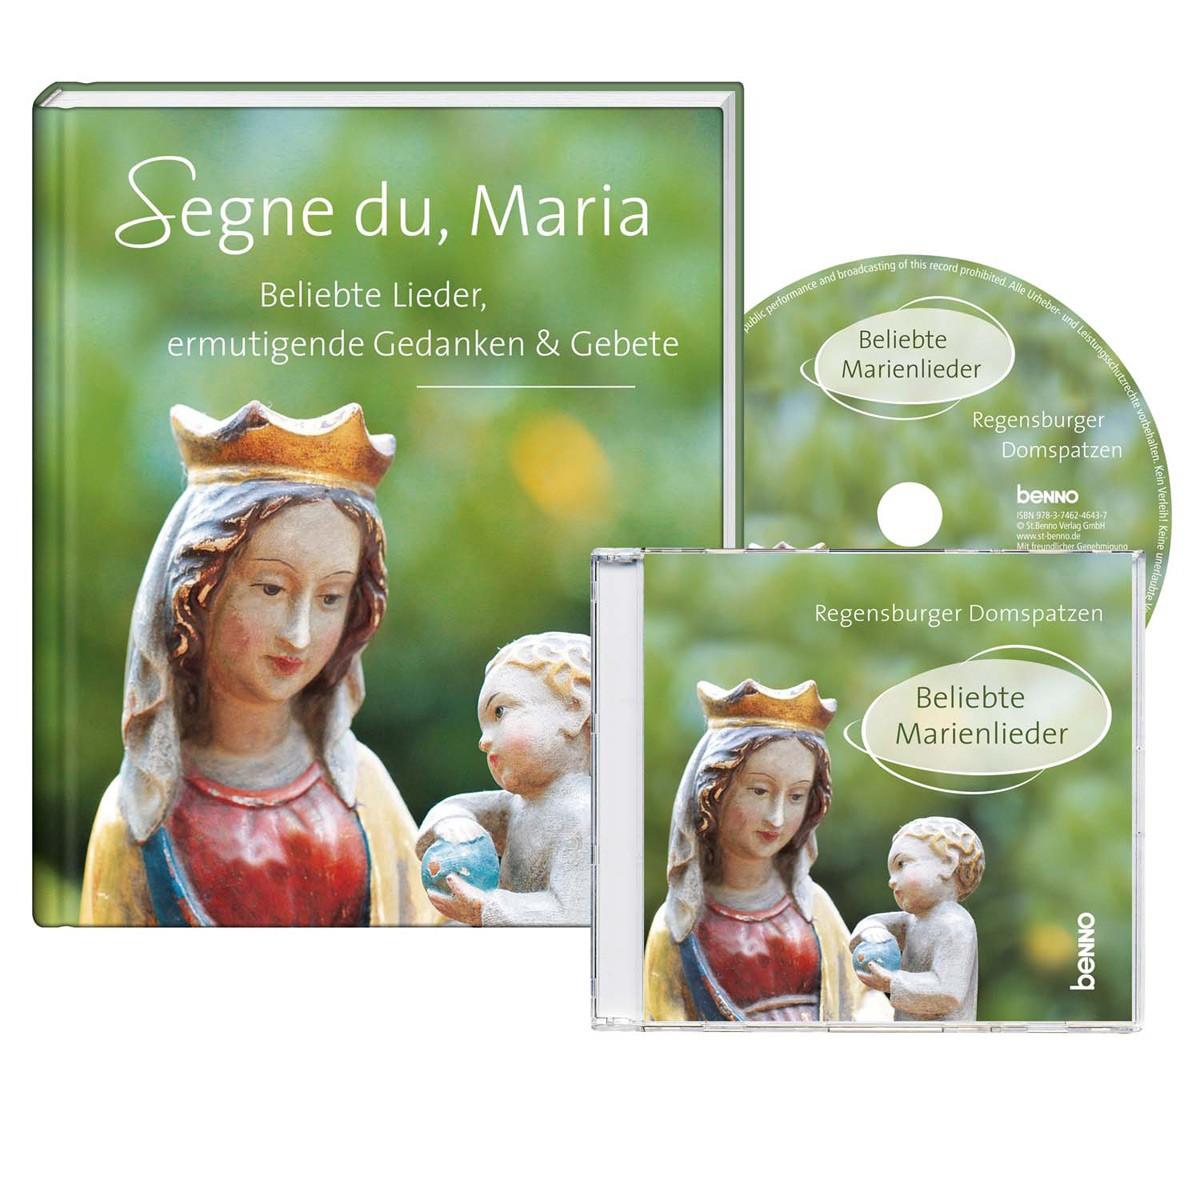 Segne du, Maria - CD & Buch